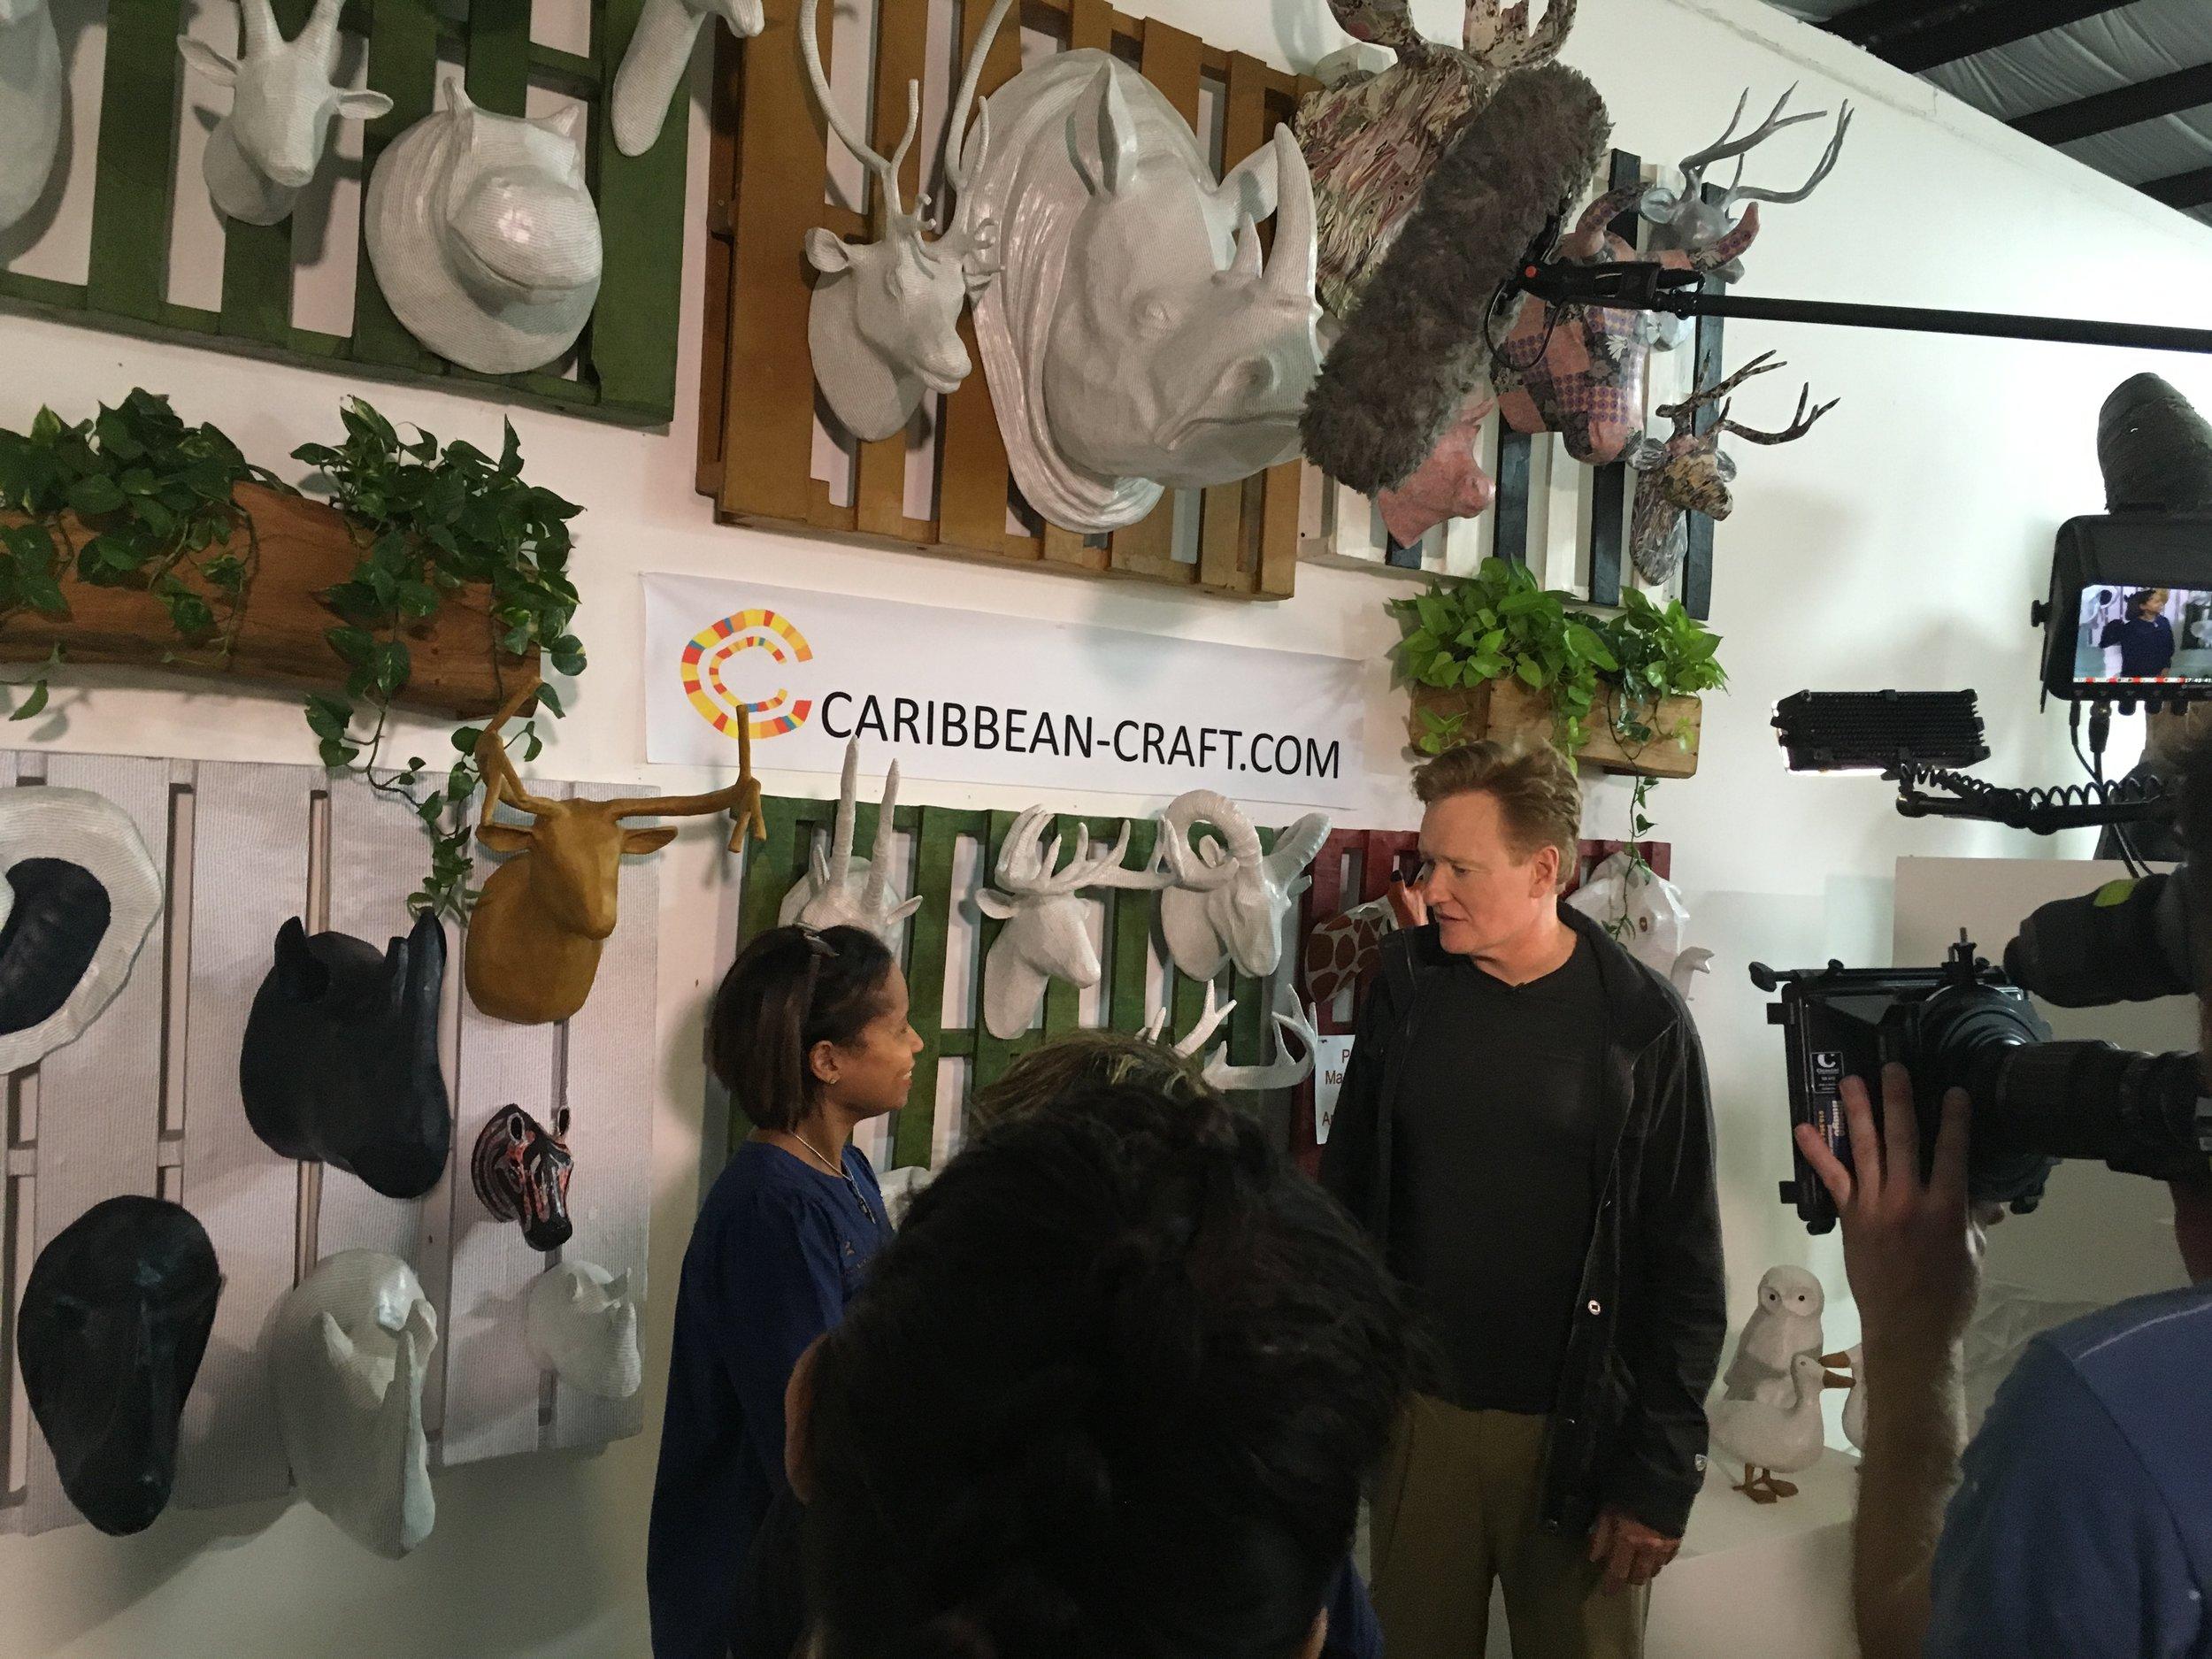 Conan O'Brien interviewing Magalie Noel Dresse